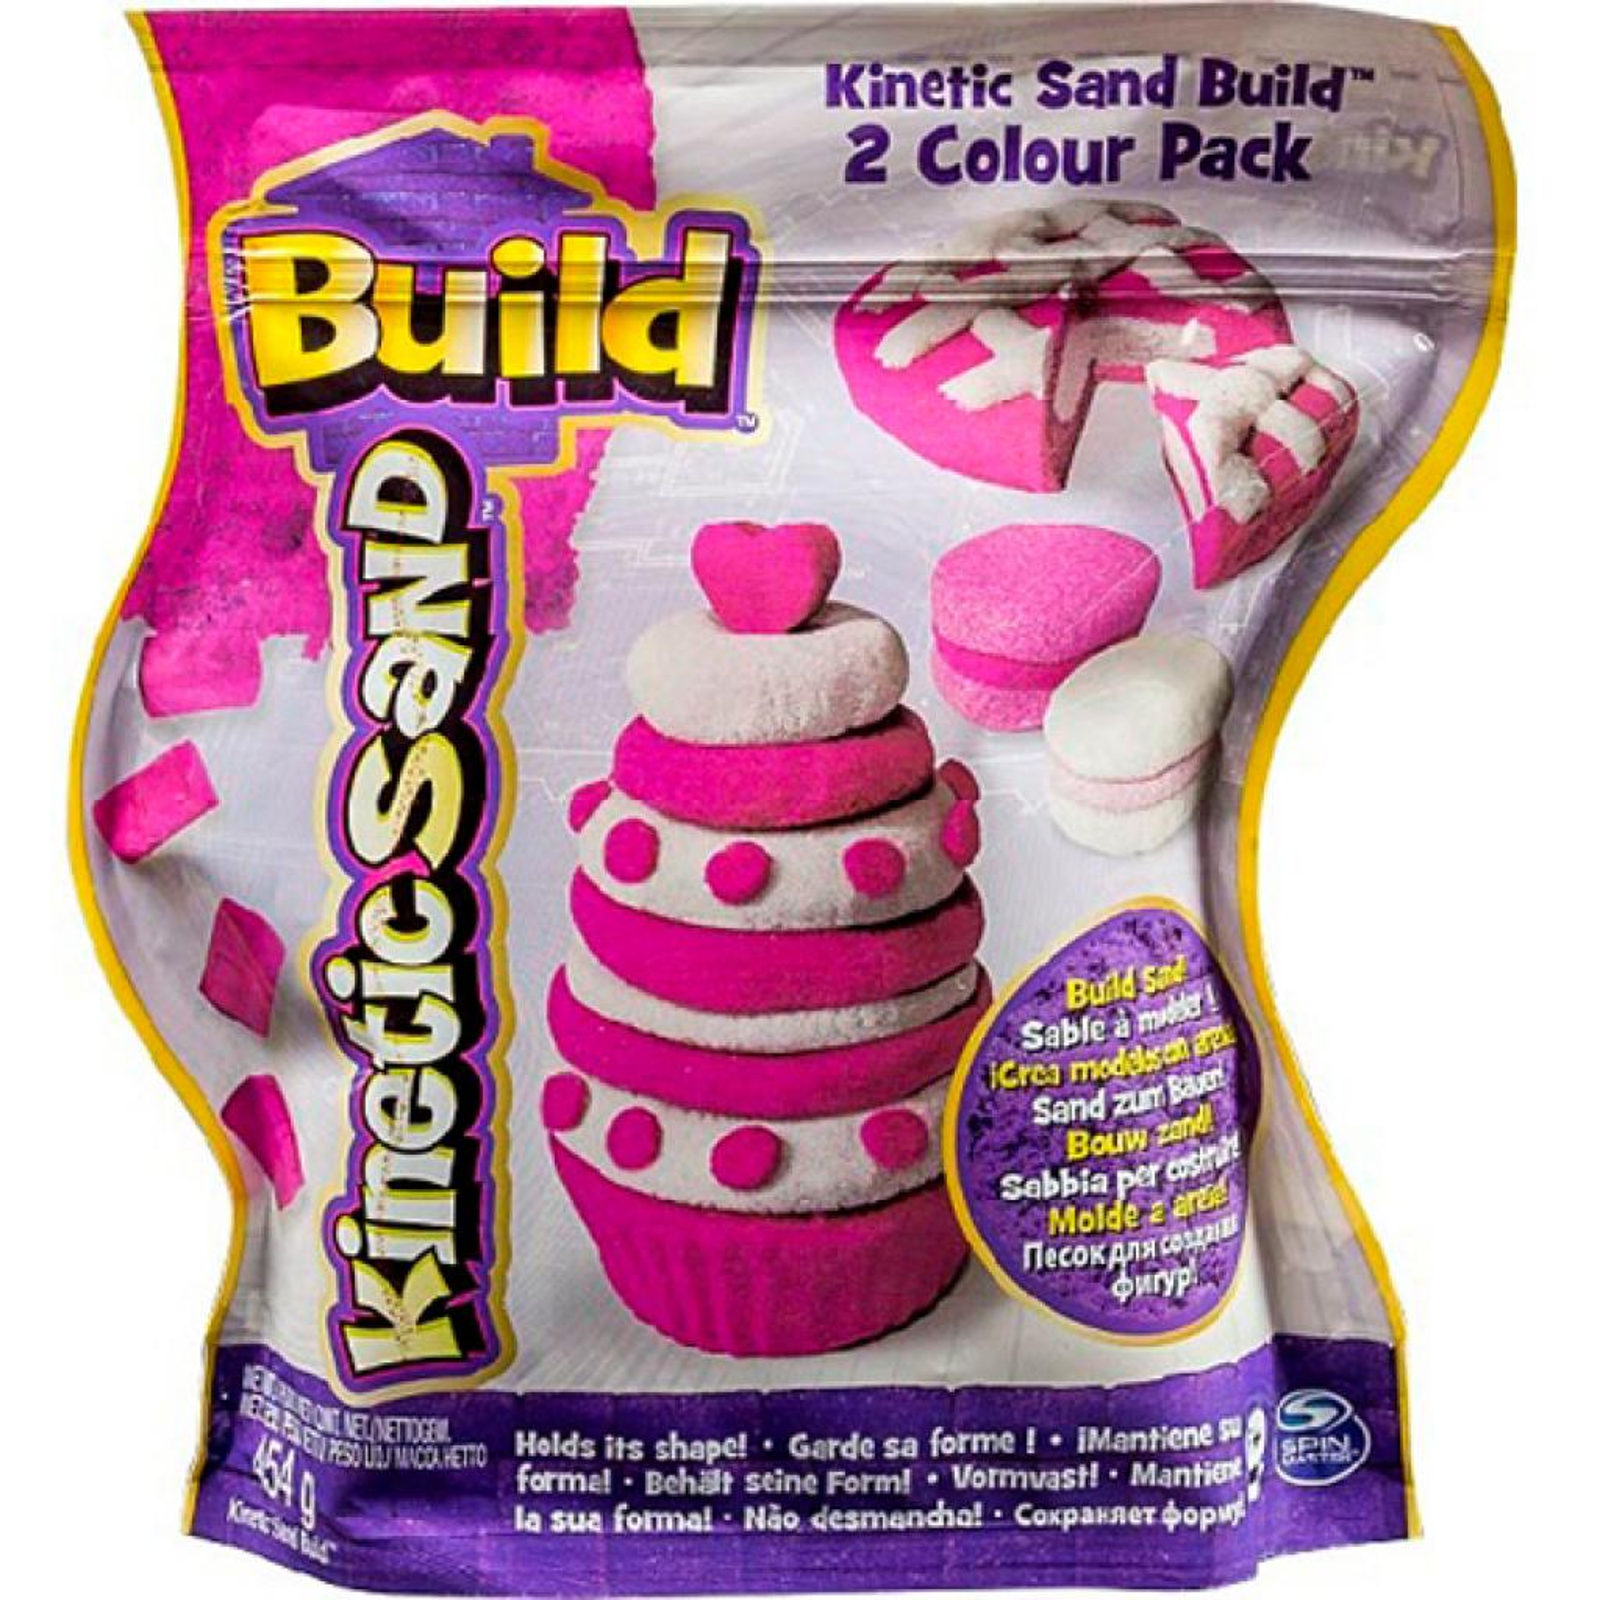 Набор для творчества Wacky-Tivities Kinetic sand build белый, розовый (71428WPn)